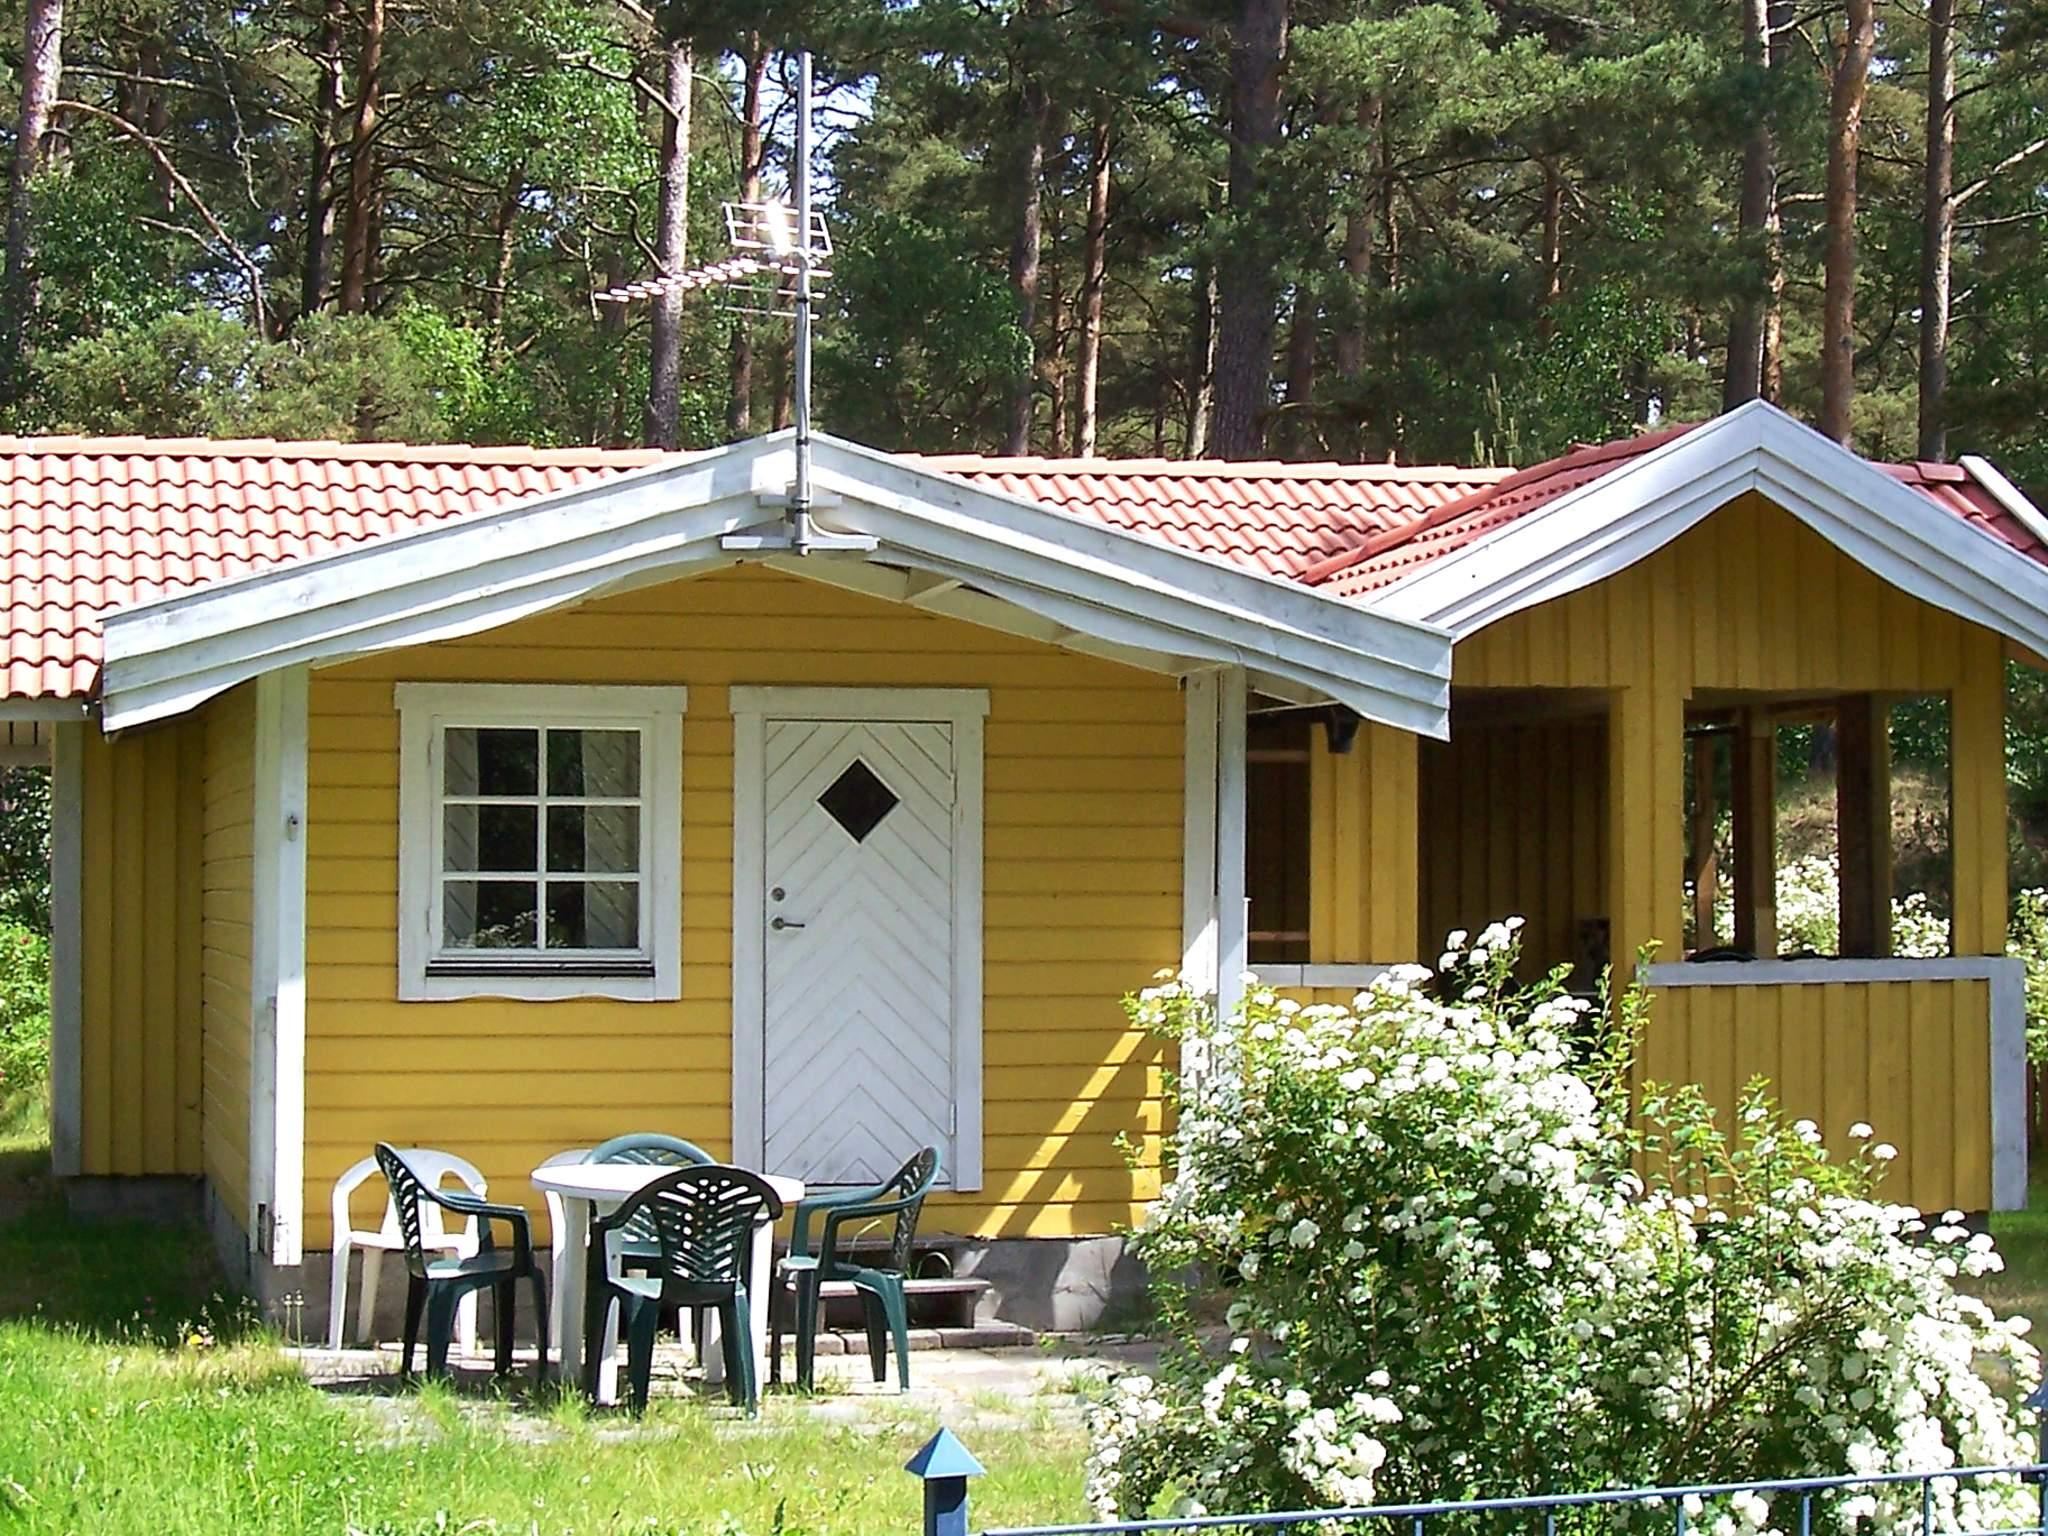 Ferienhaus Mellbystrand (124290), Mellbystrand, Hallands län, Südschweden, Schweden, Bild 1